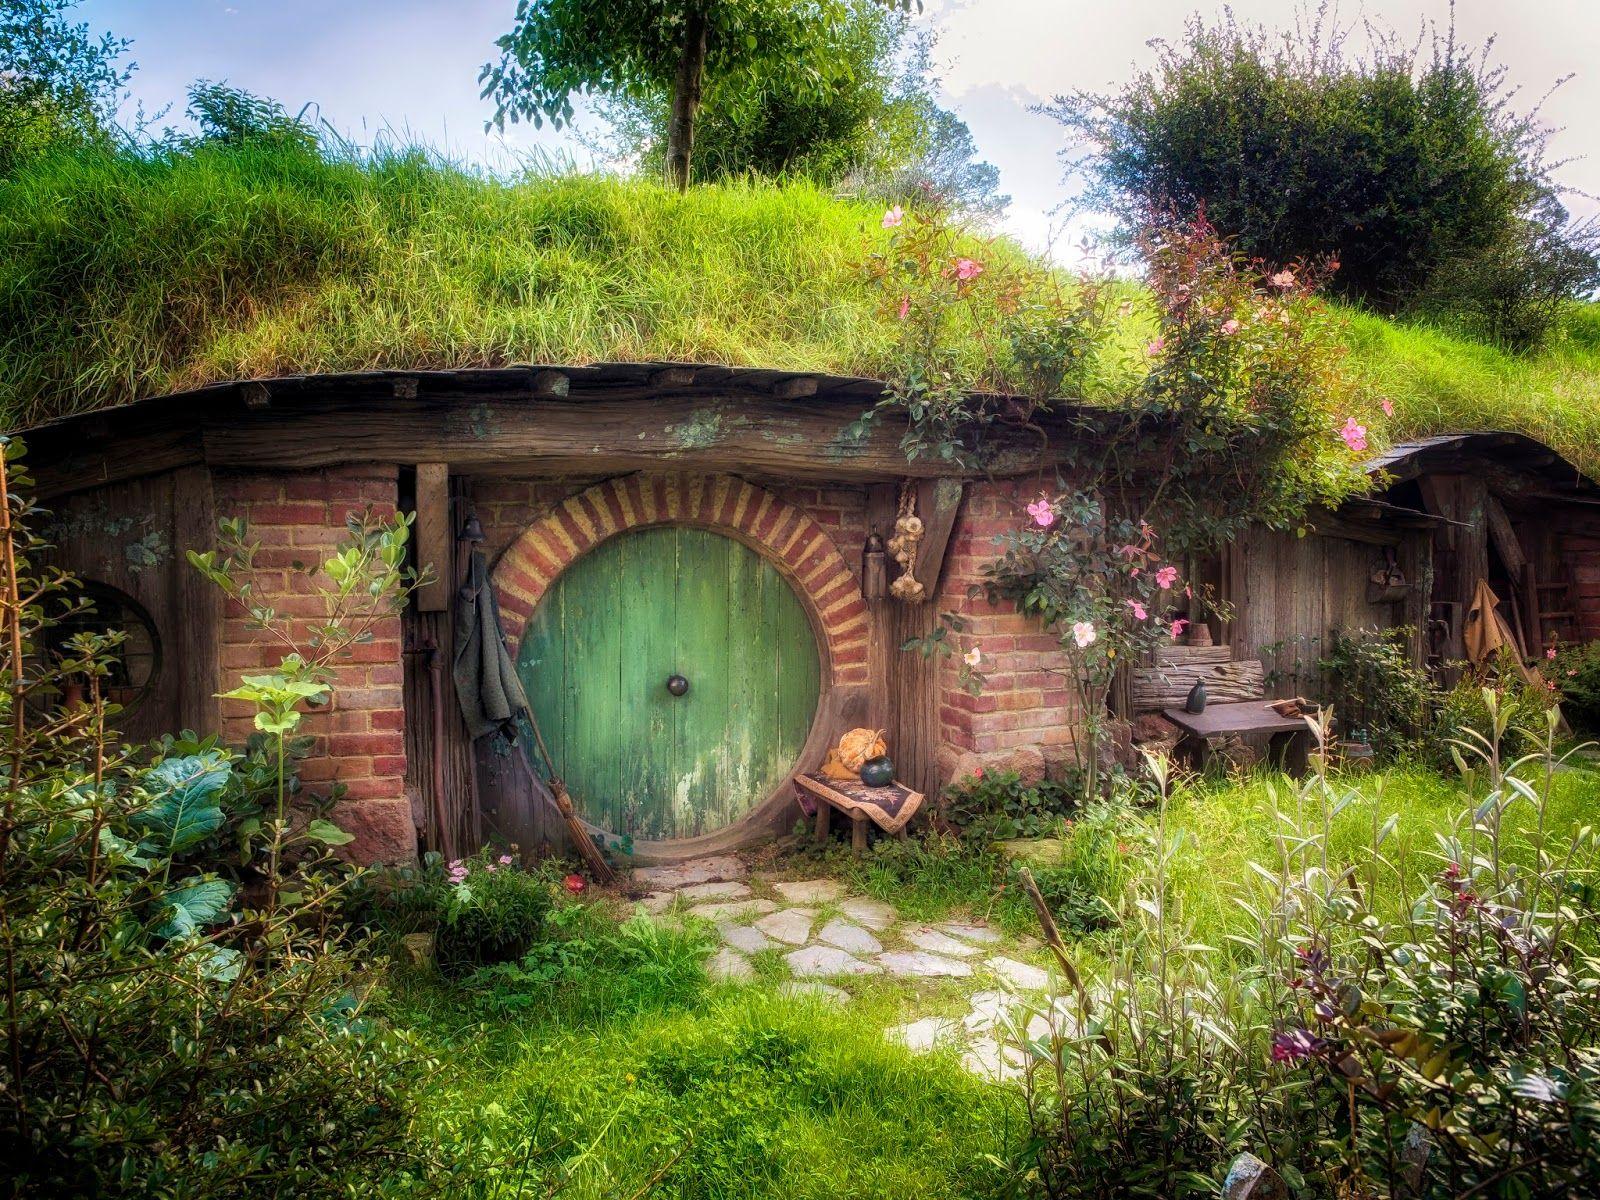 50 best hobbiton images on pinterest middle earth the hobbit hobbiton wallpaper google search gnome househobbit